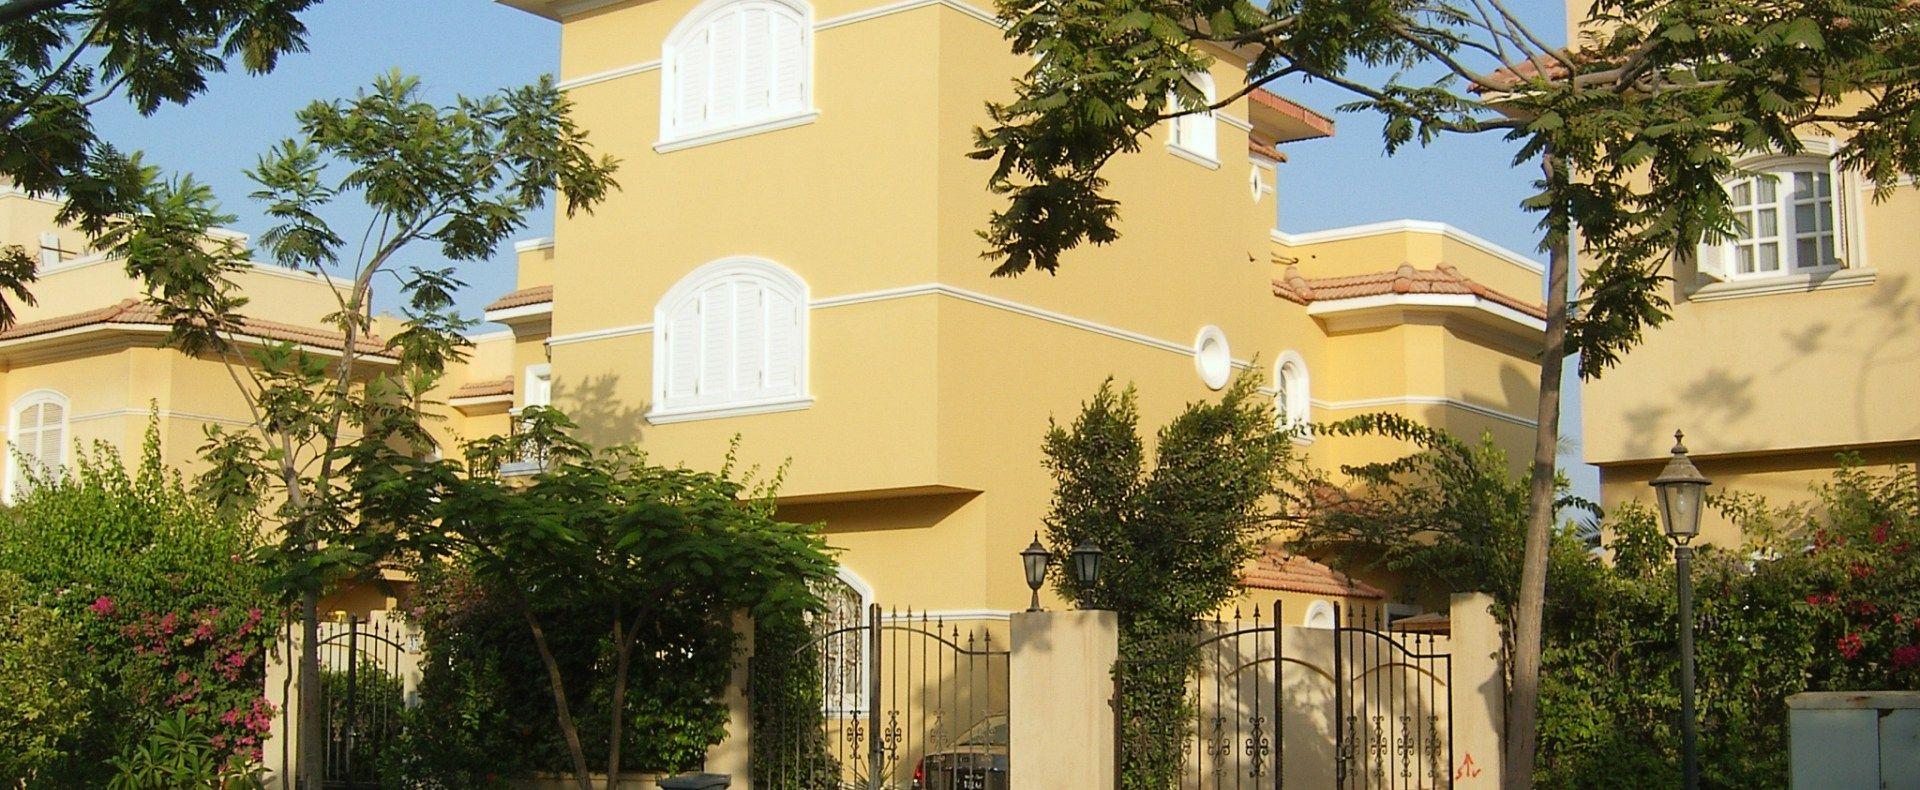 Villa 4 Sale at Yasmin Green Land Compound 6 October